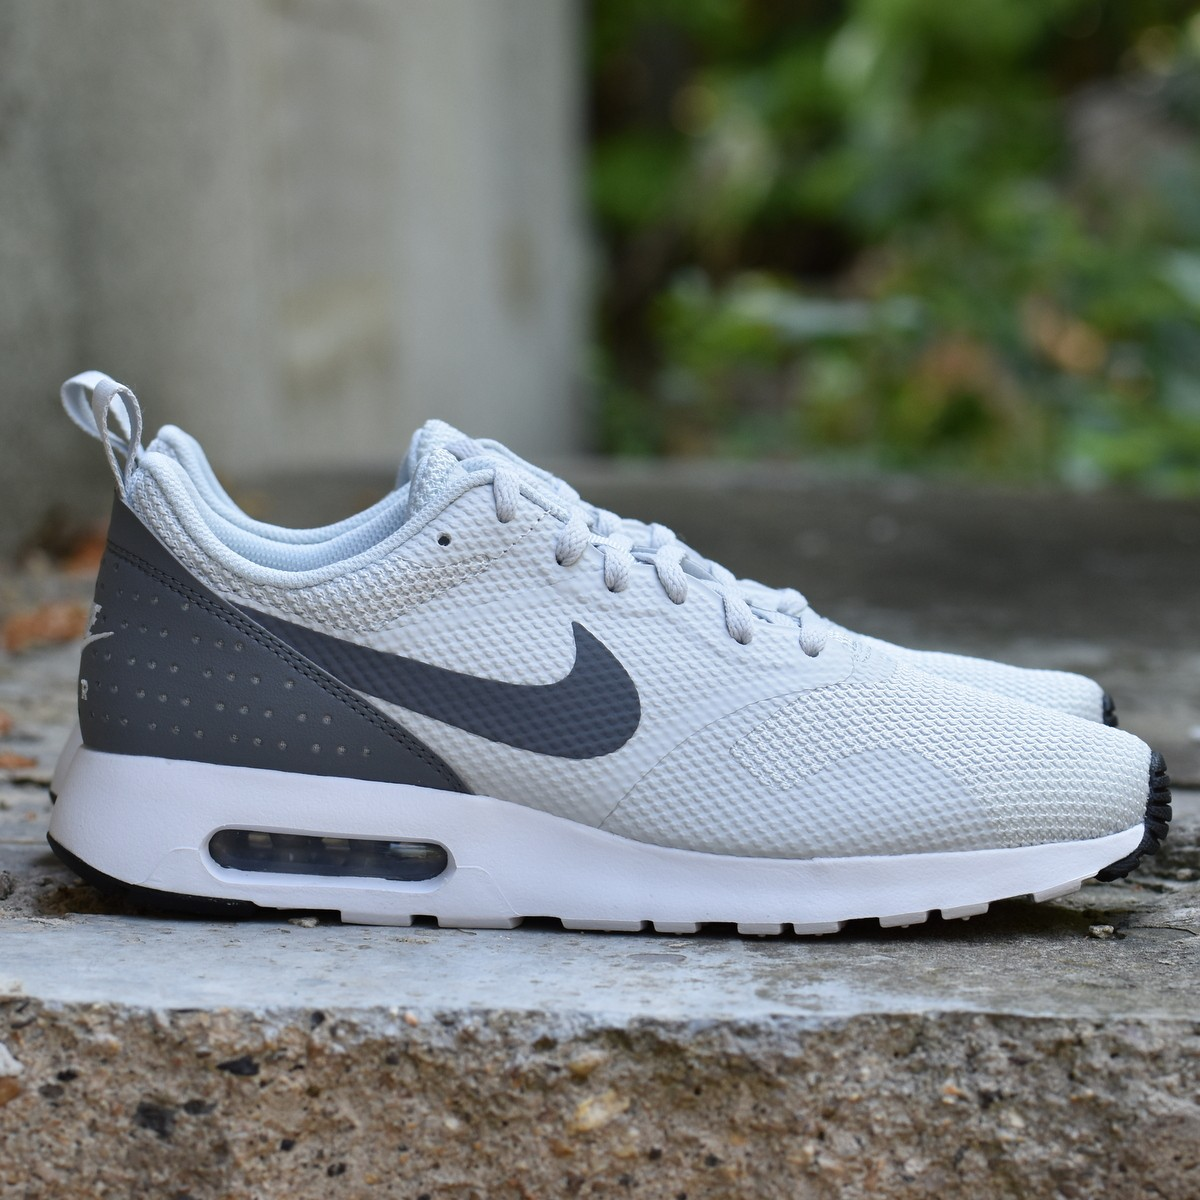 a7489a4f970 Nike AIR MAX TAVAS Pánské boty EU 44.5 705149-006